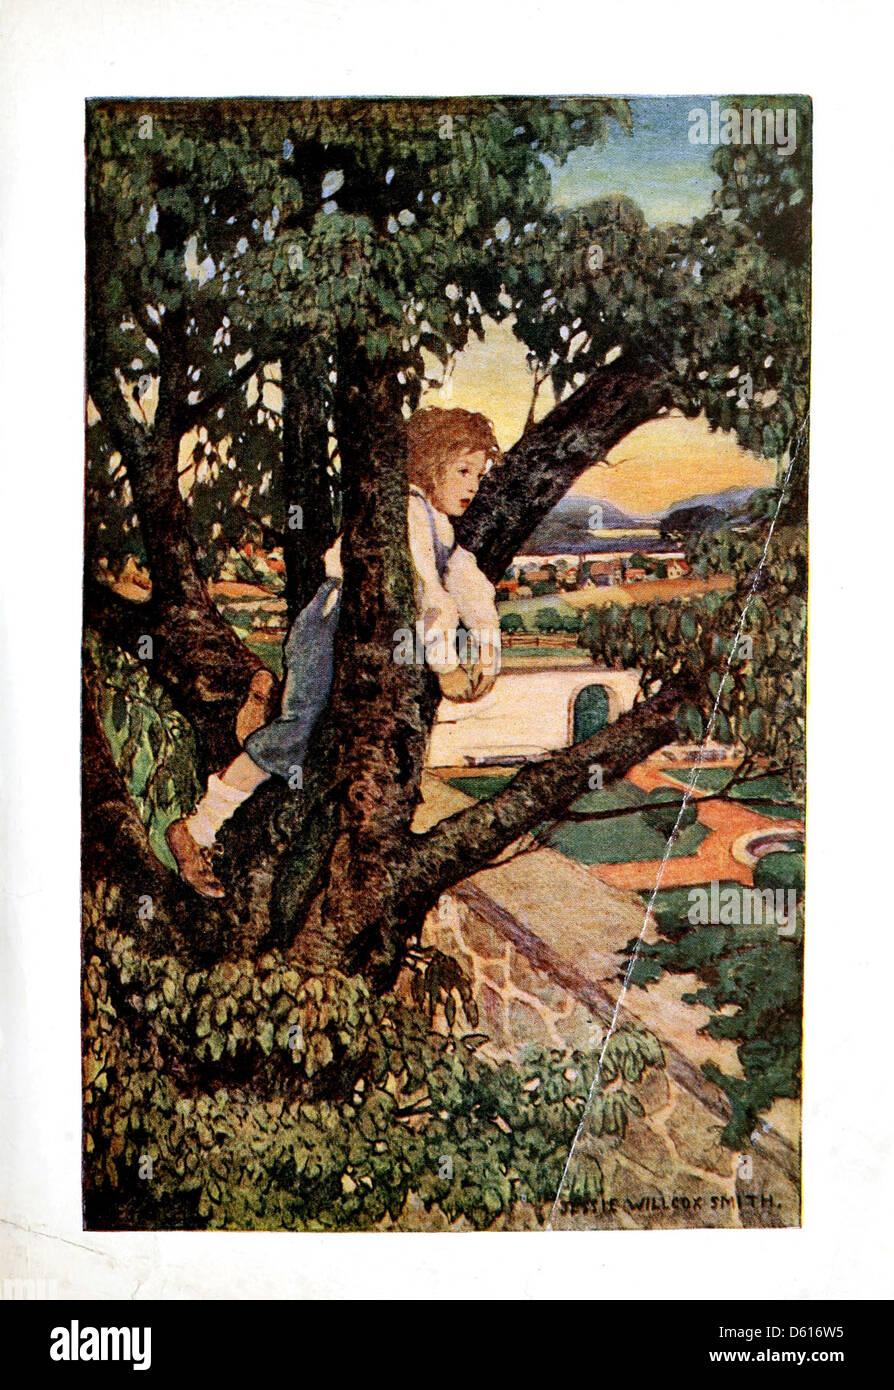 Garden Of Verses Stock Photos & Garden Of Verses Stock Images - Alamy